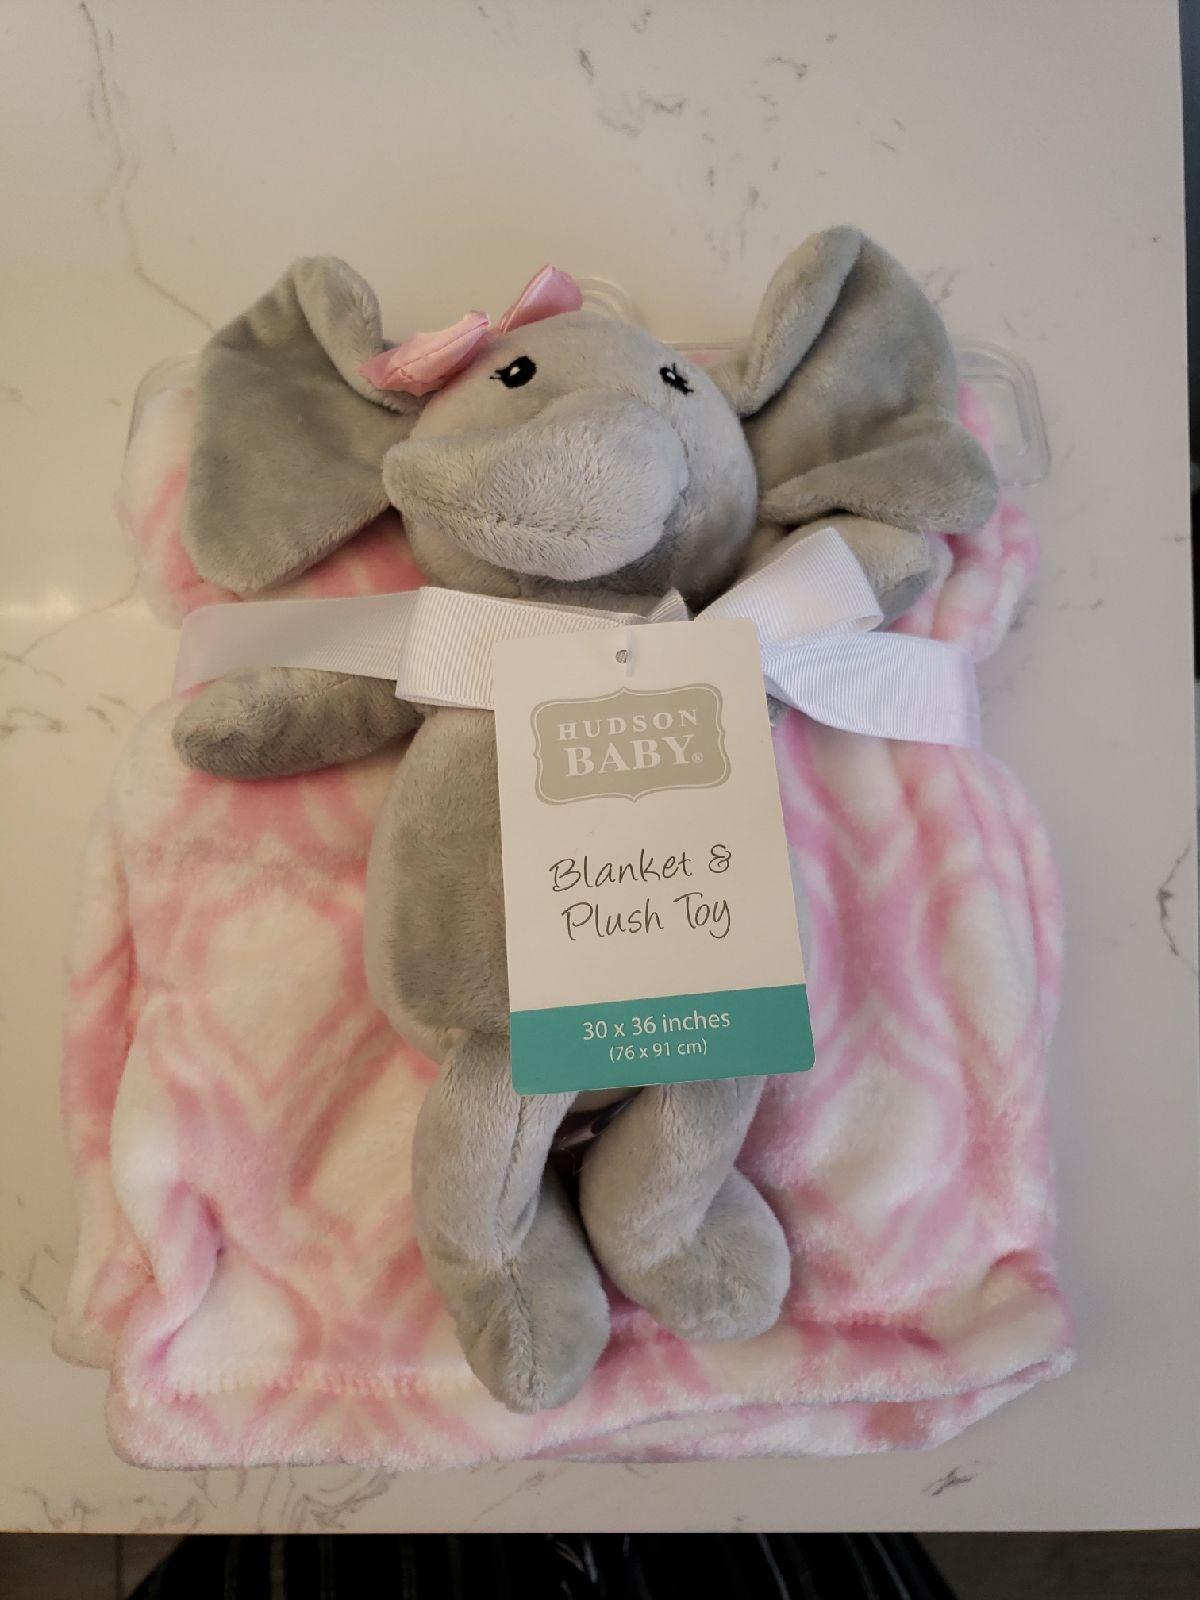 Baby Blanket with Plush Toy Elephant